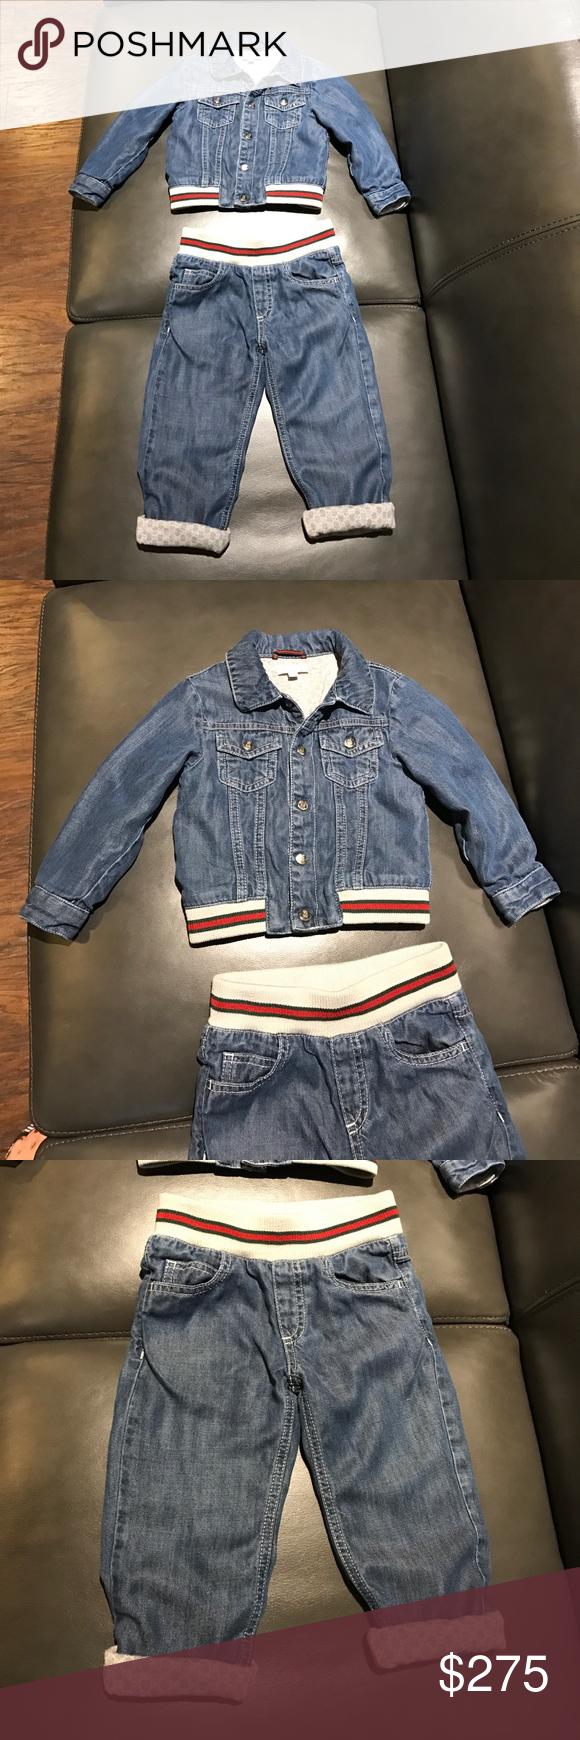 513c55799 Gucci baby boy soft denim jacket & jeans 18-24 m Authentic Gucci baby boy  signature soft denim jacket & jeans 18-24 months very good condition light  wear ...